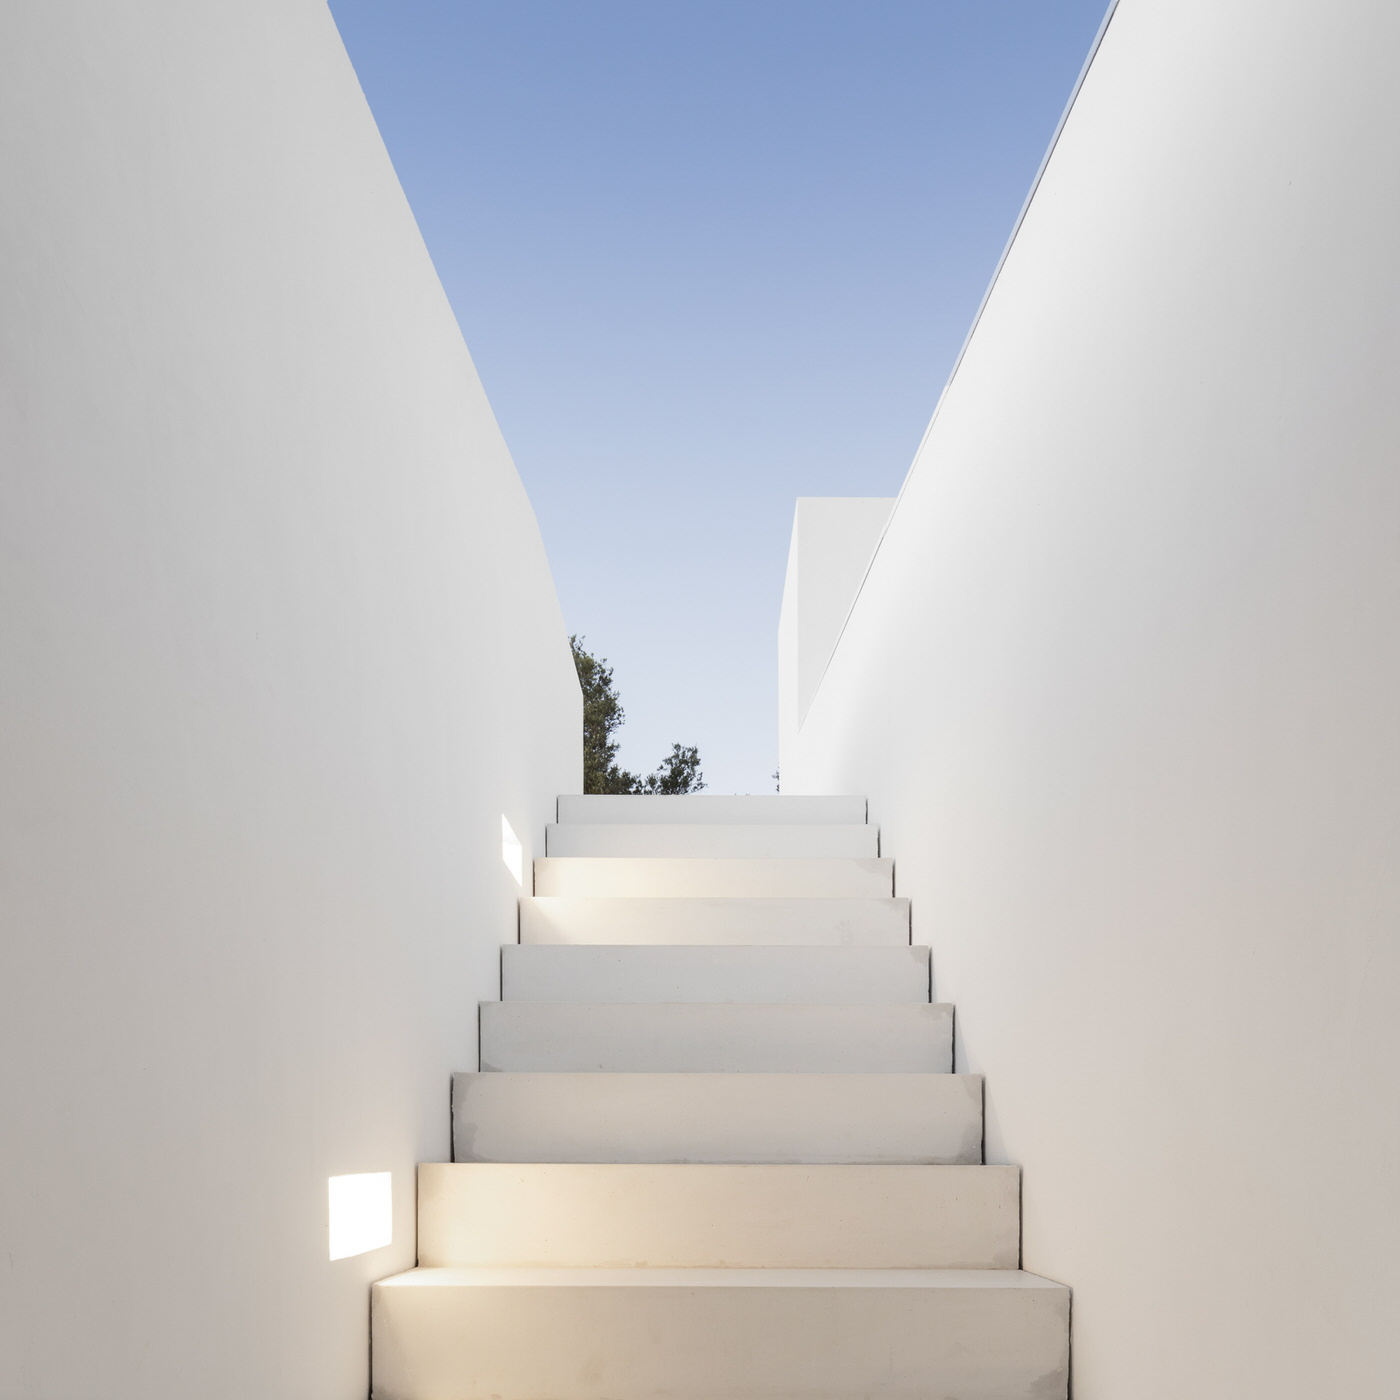 Zalig-Algarve-Casa-Luum-141-1_1